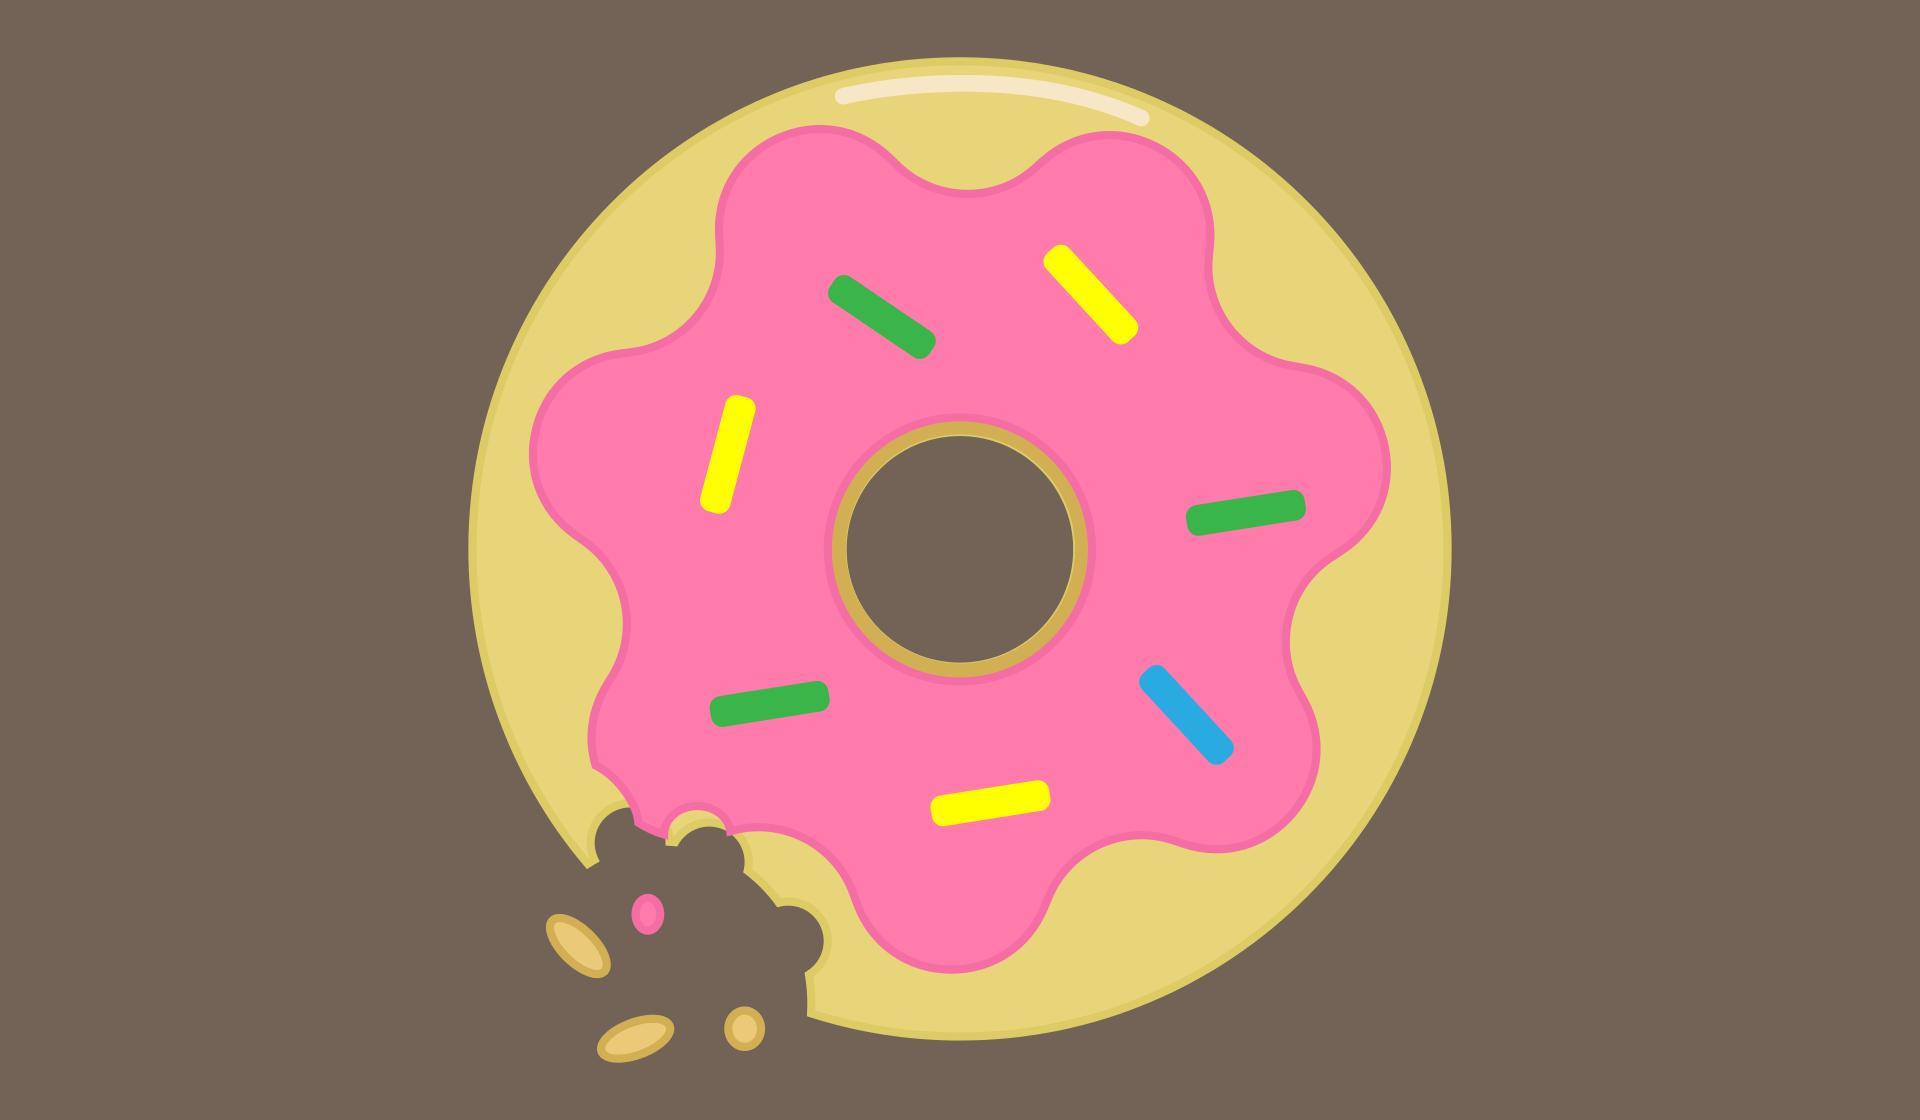 donut, 甜甜圈, 甜, 甜点, 釉料 - 高清壁纸 - 教授-falken.com